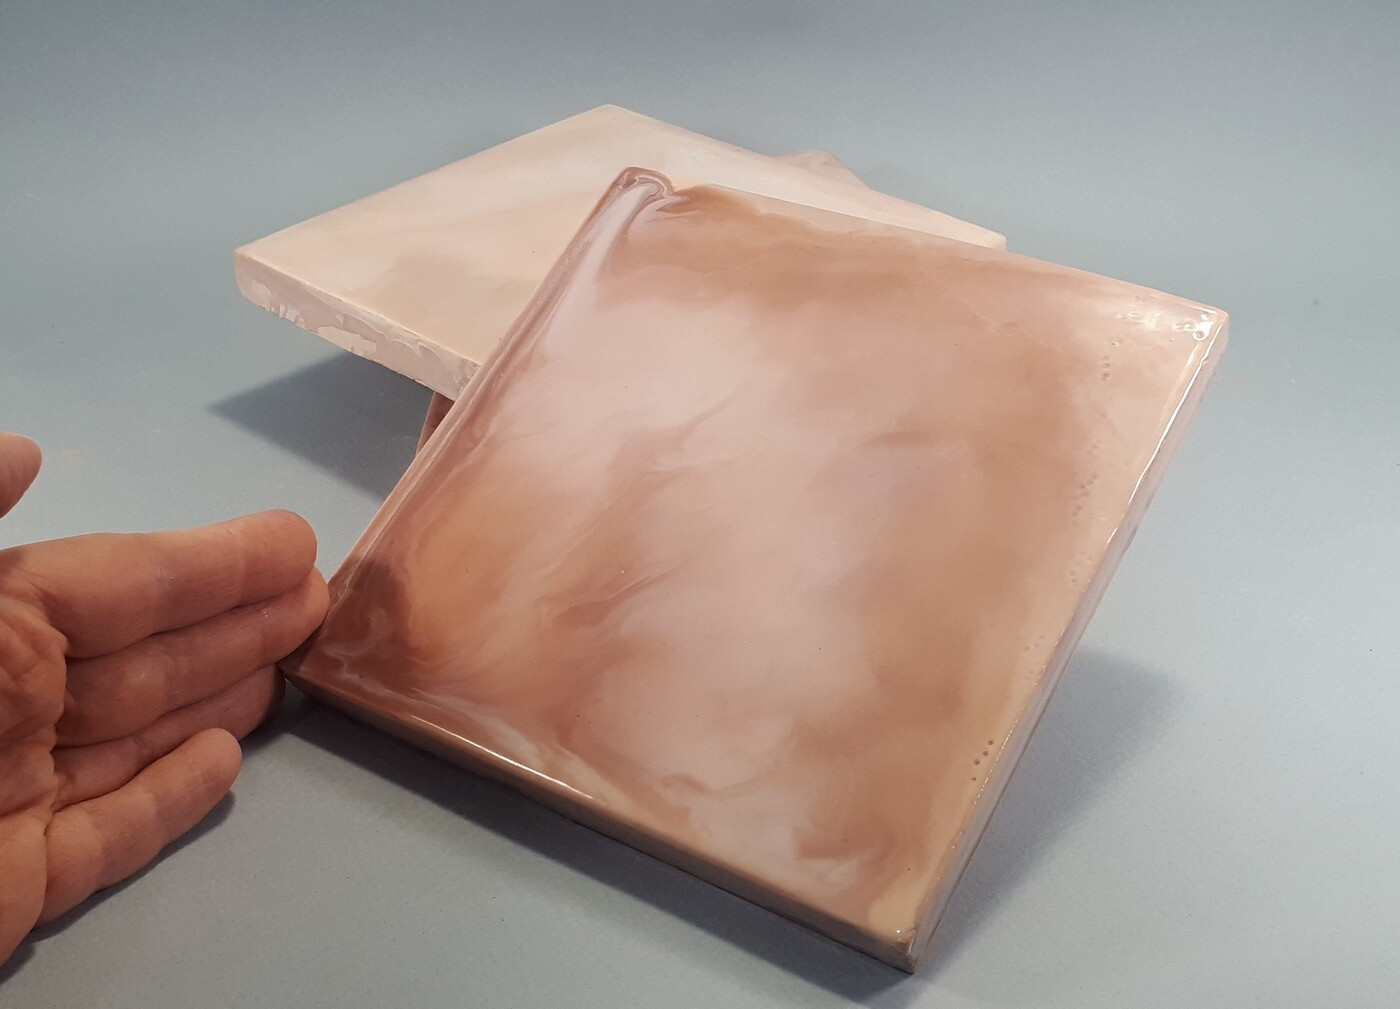 Изразцовая плитка в мраморном стиле. Цвет - какао. Для фасада, кухни, камина, пола. 150х150х14мм